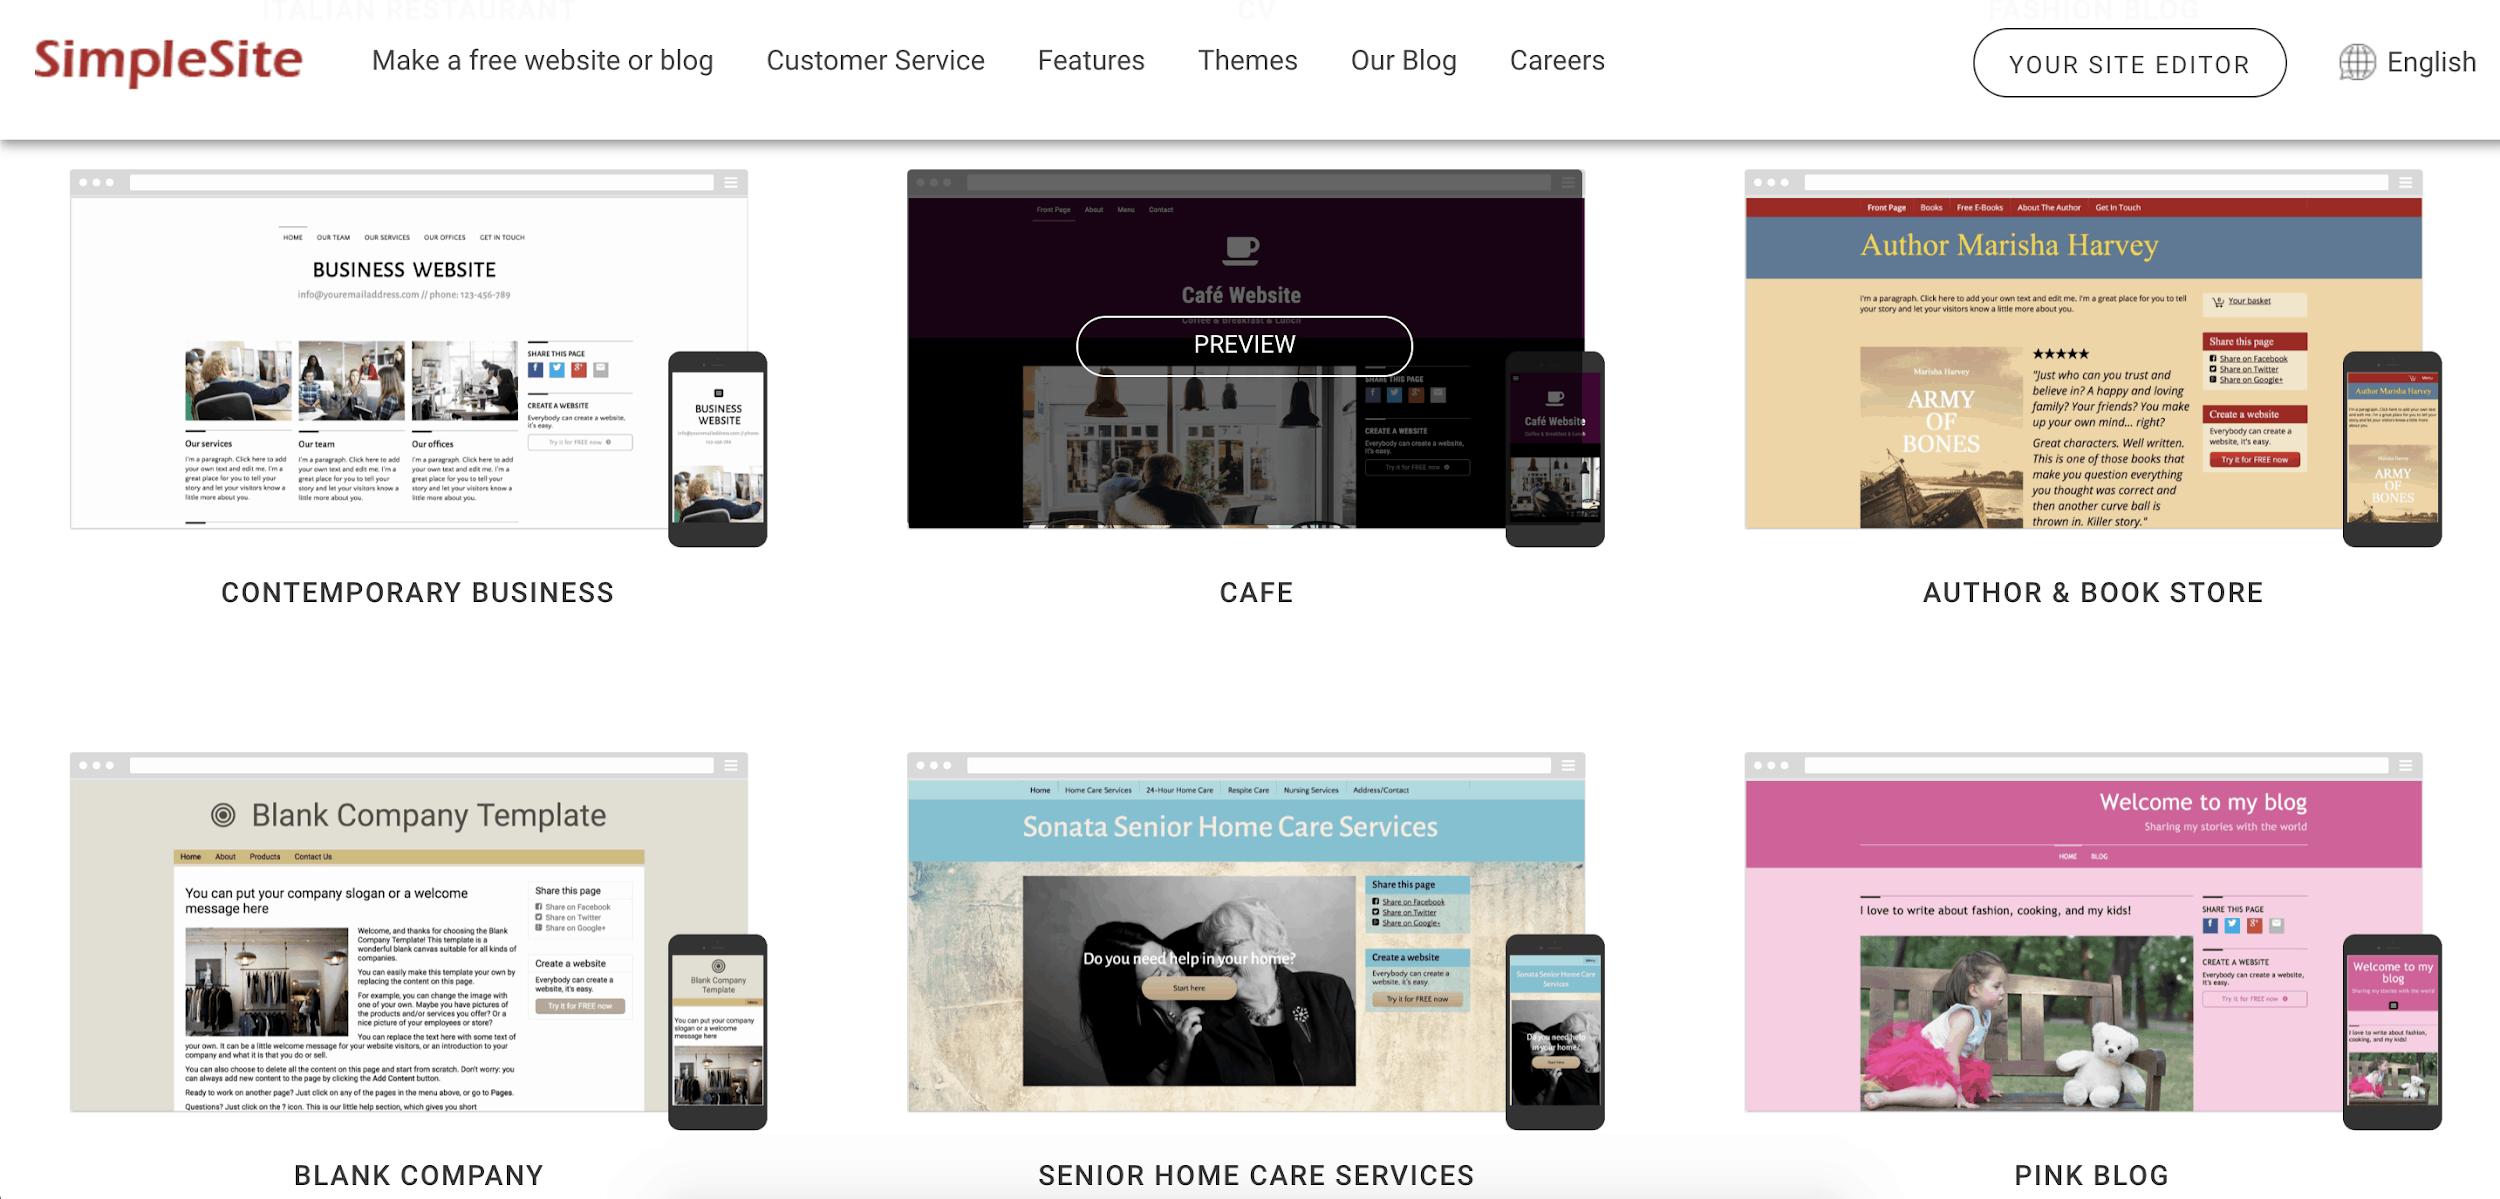 SimpleSite themes